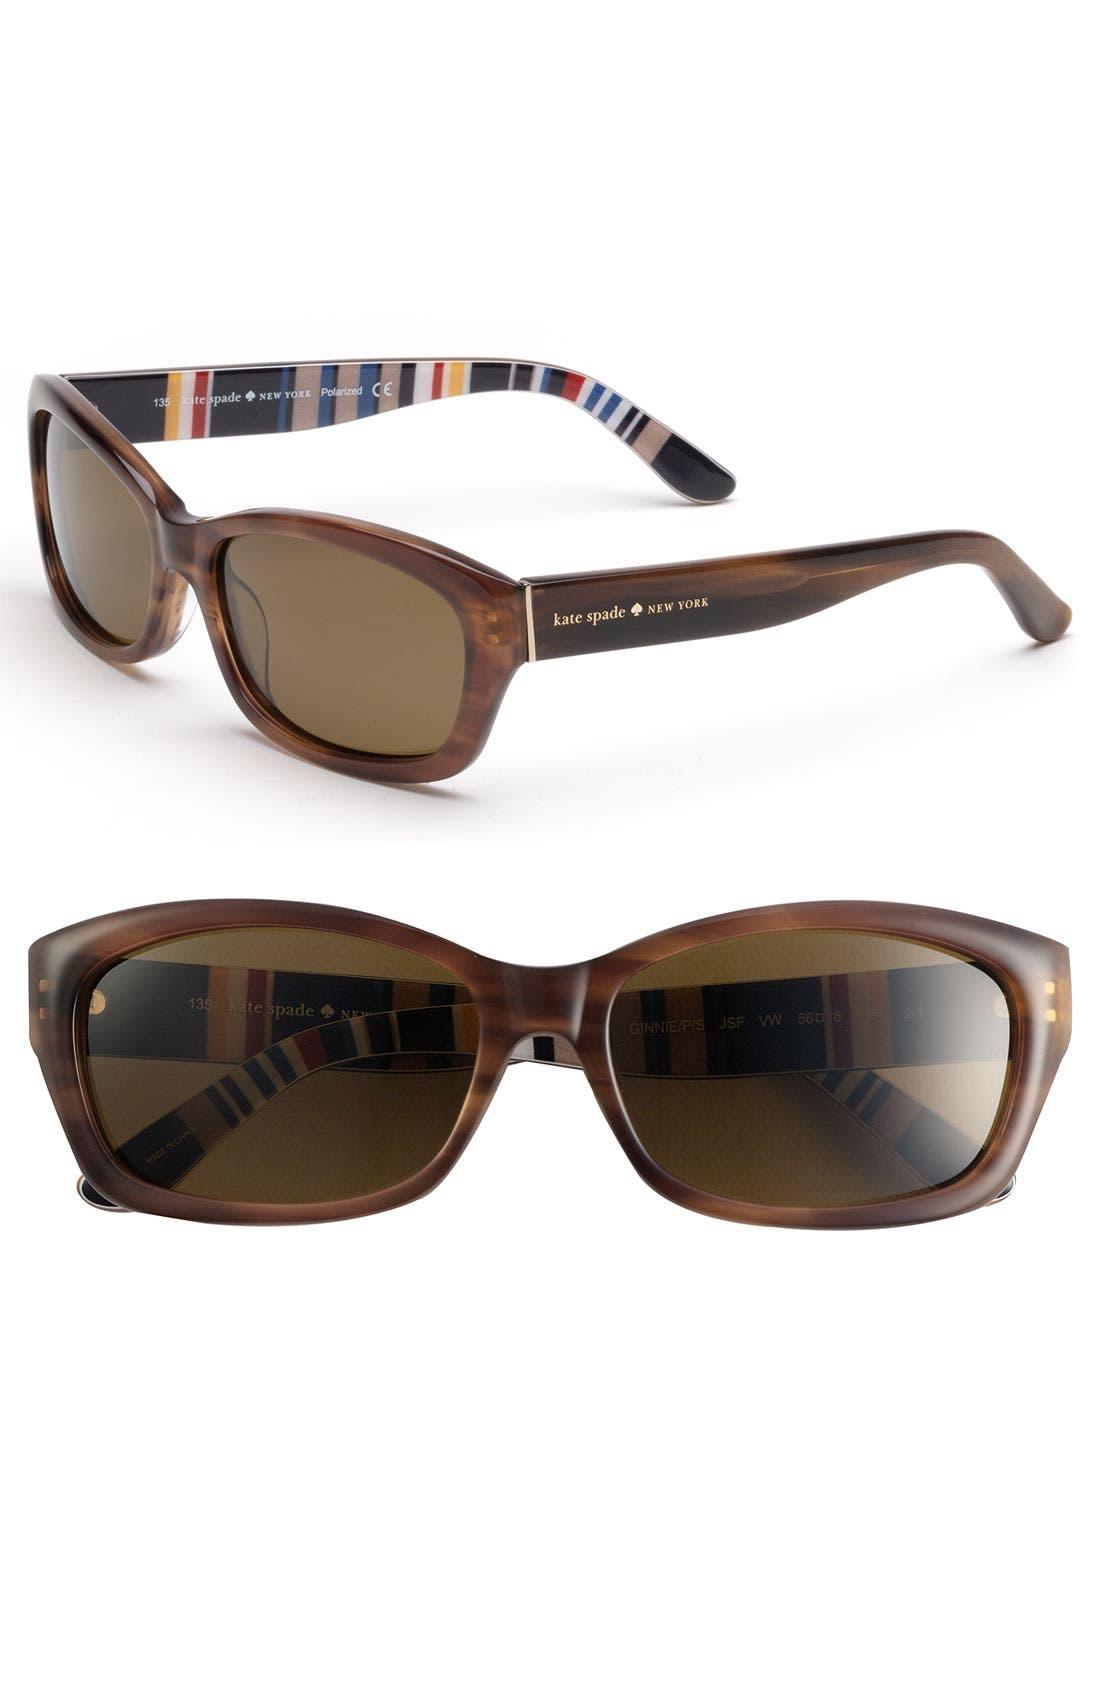 Main Image - kate spade new york 'ginnie' polarized sunglasses